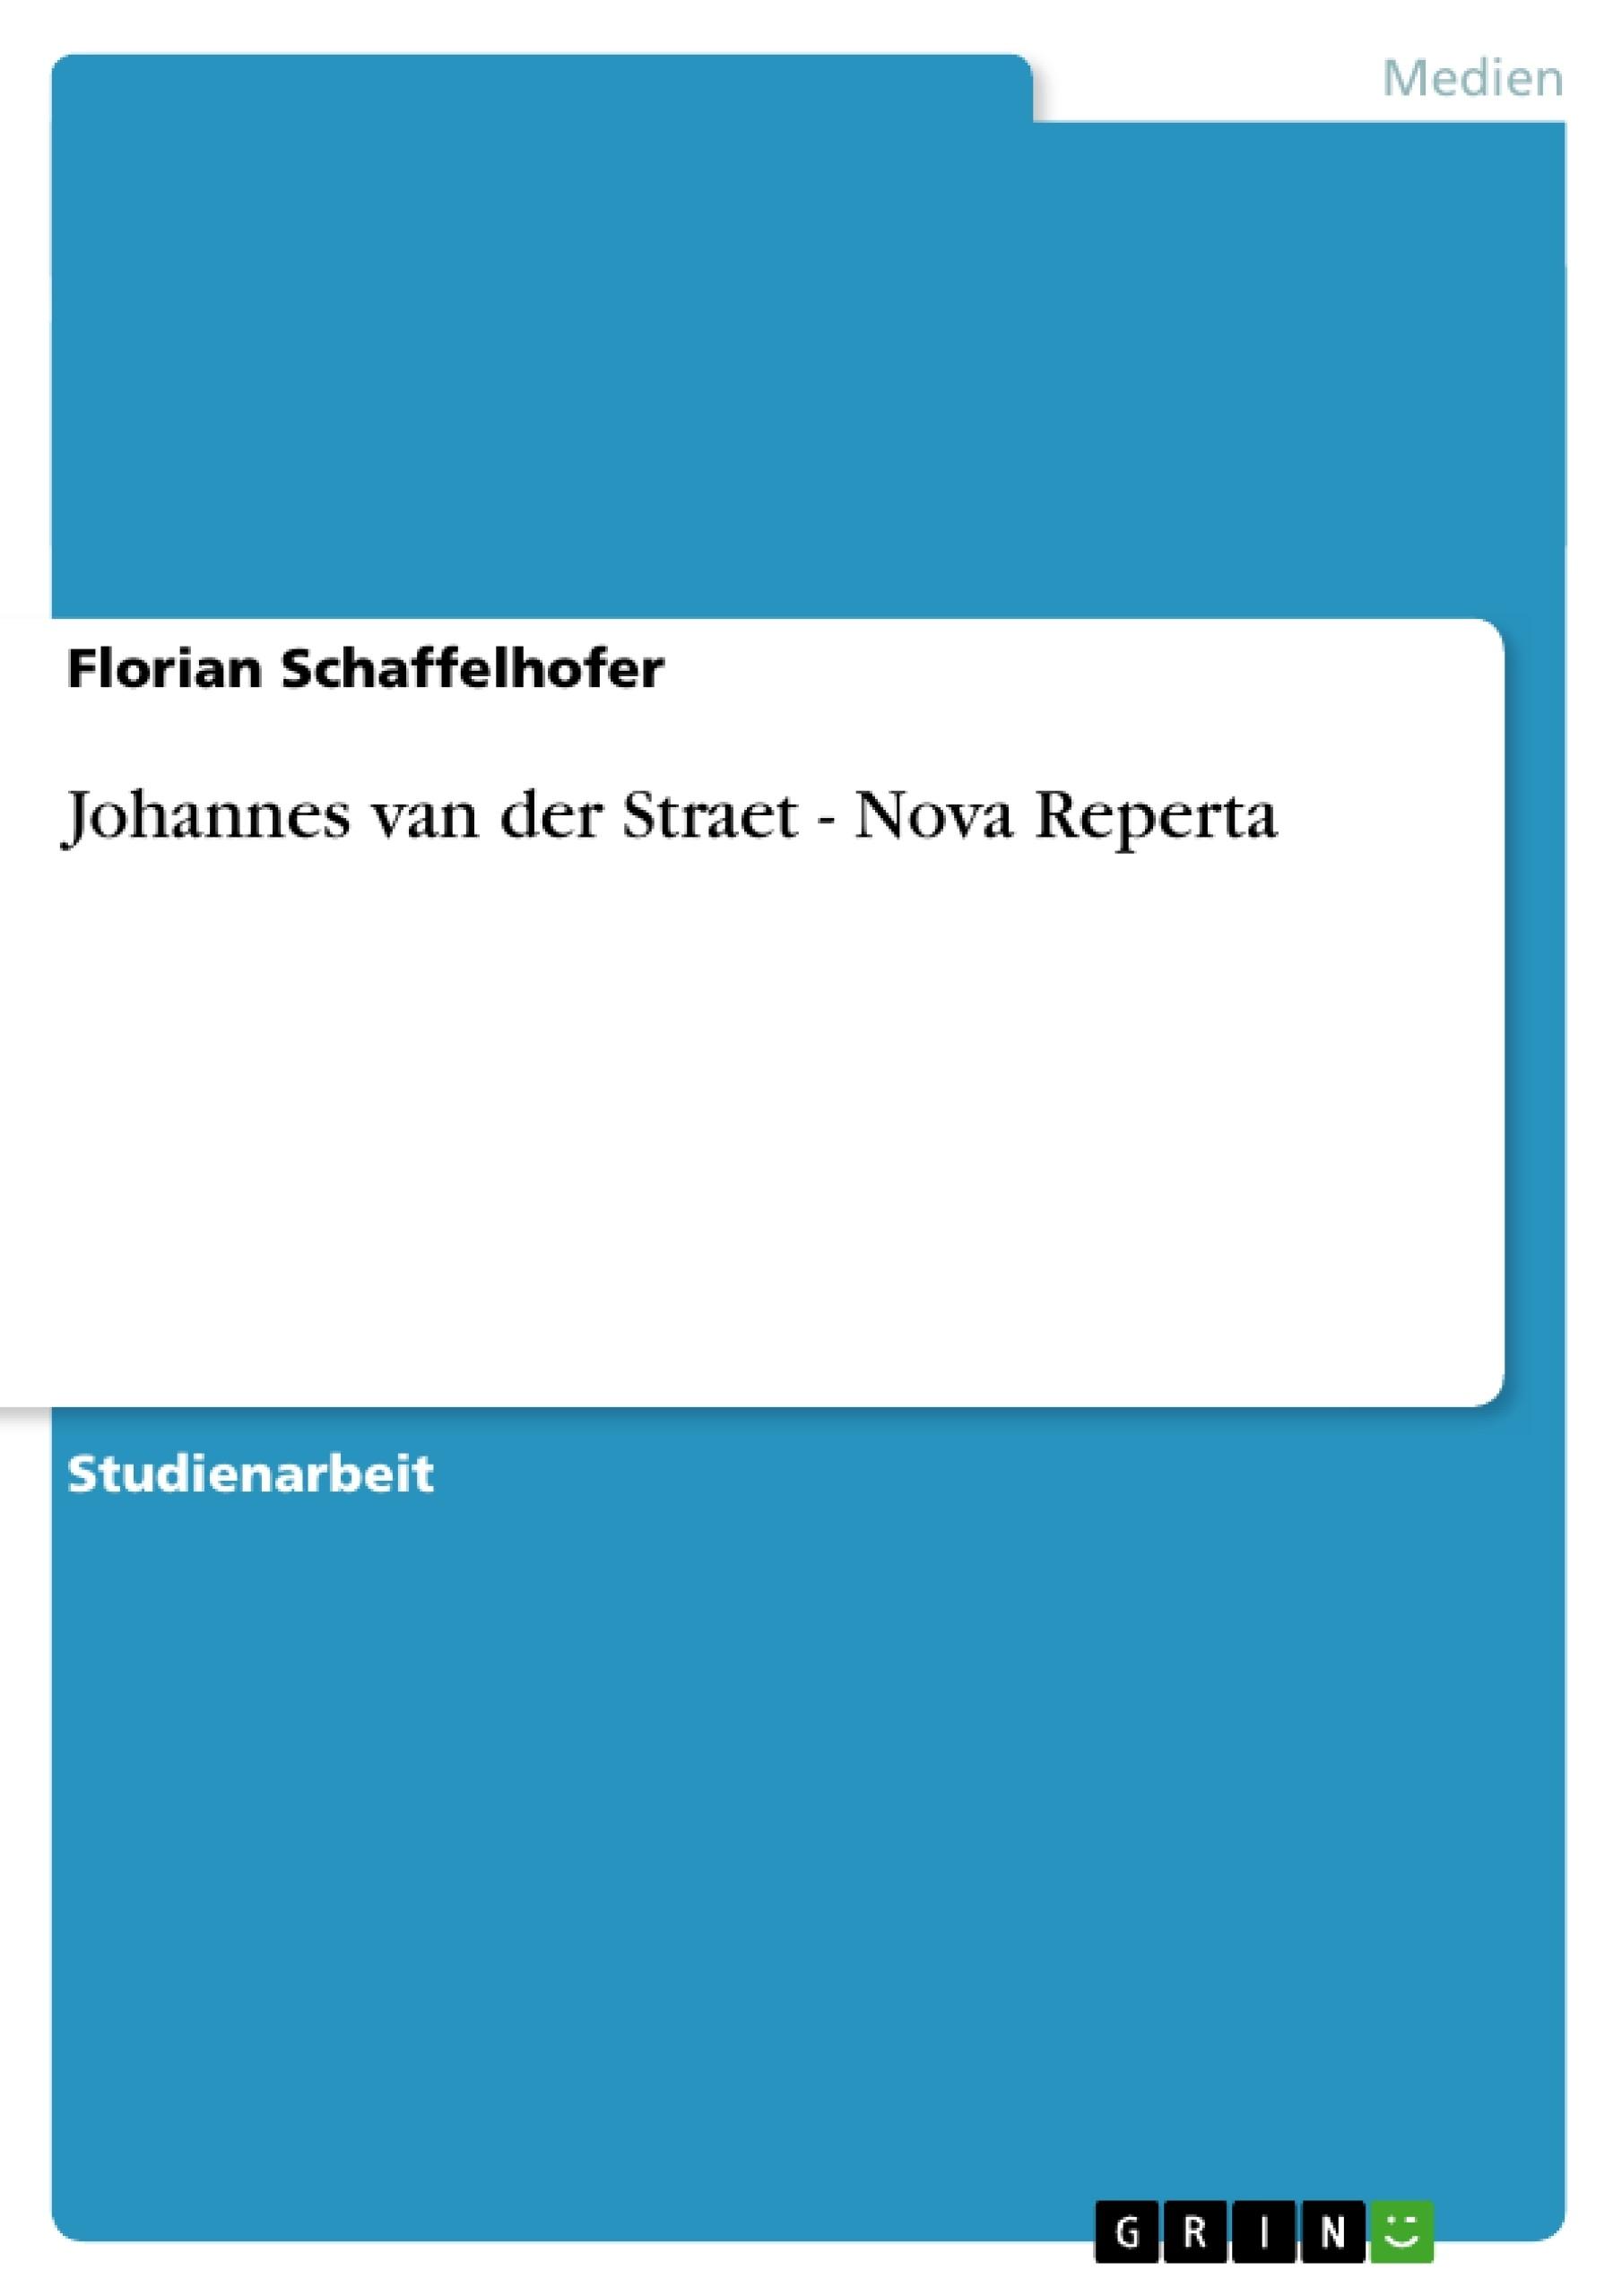 Titel: Johannes van der Straet - Nova Reperta